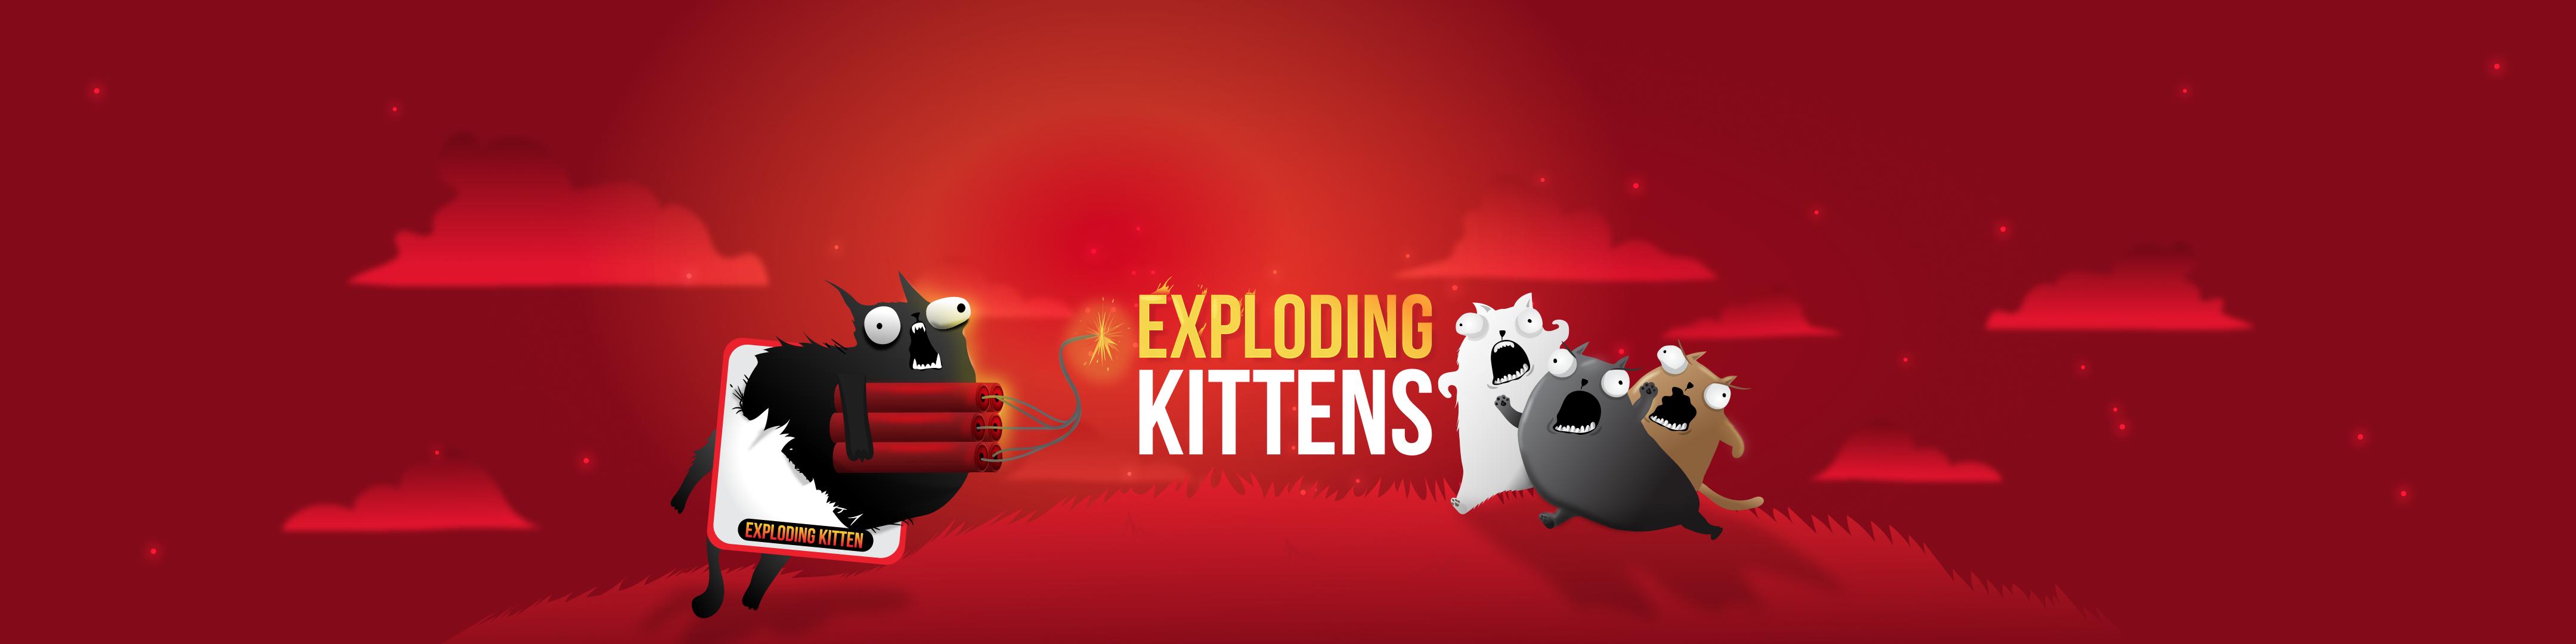 Exploding Kittens® - Revenue & Download estimates - Apple